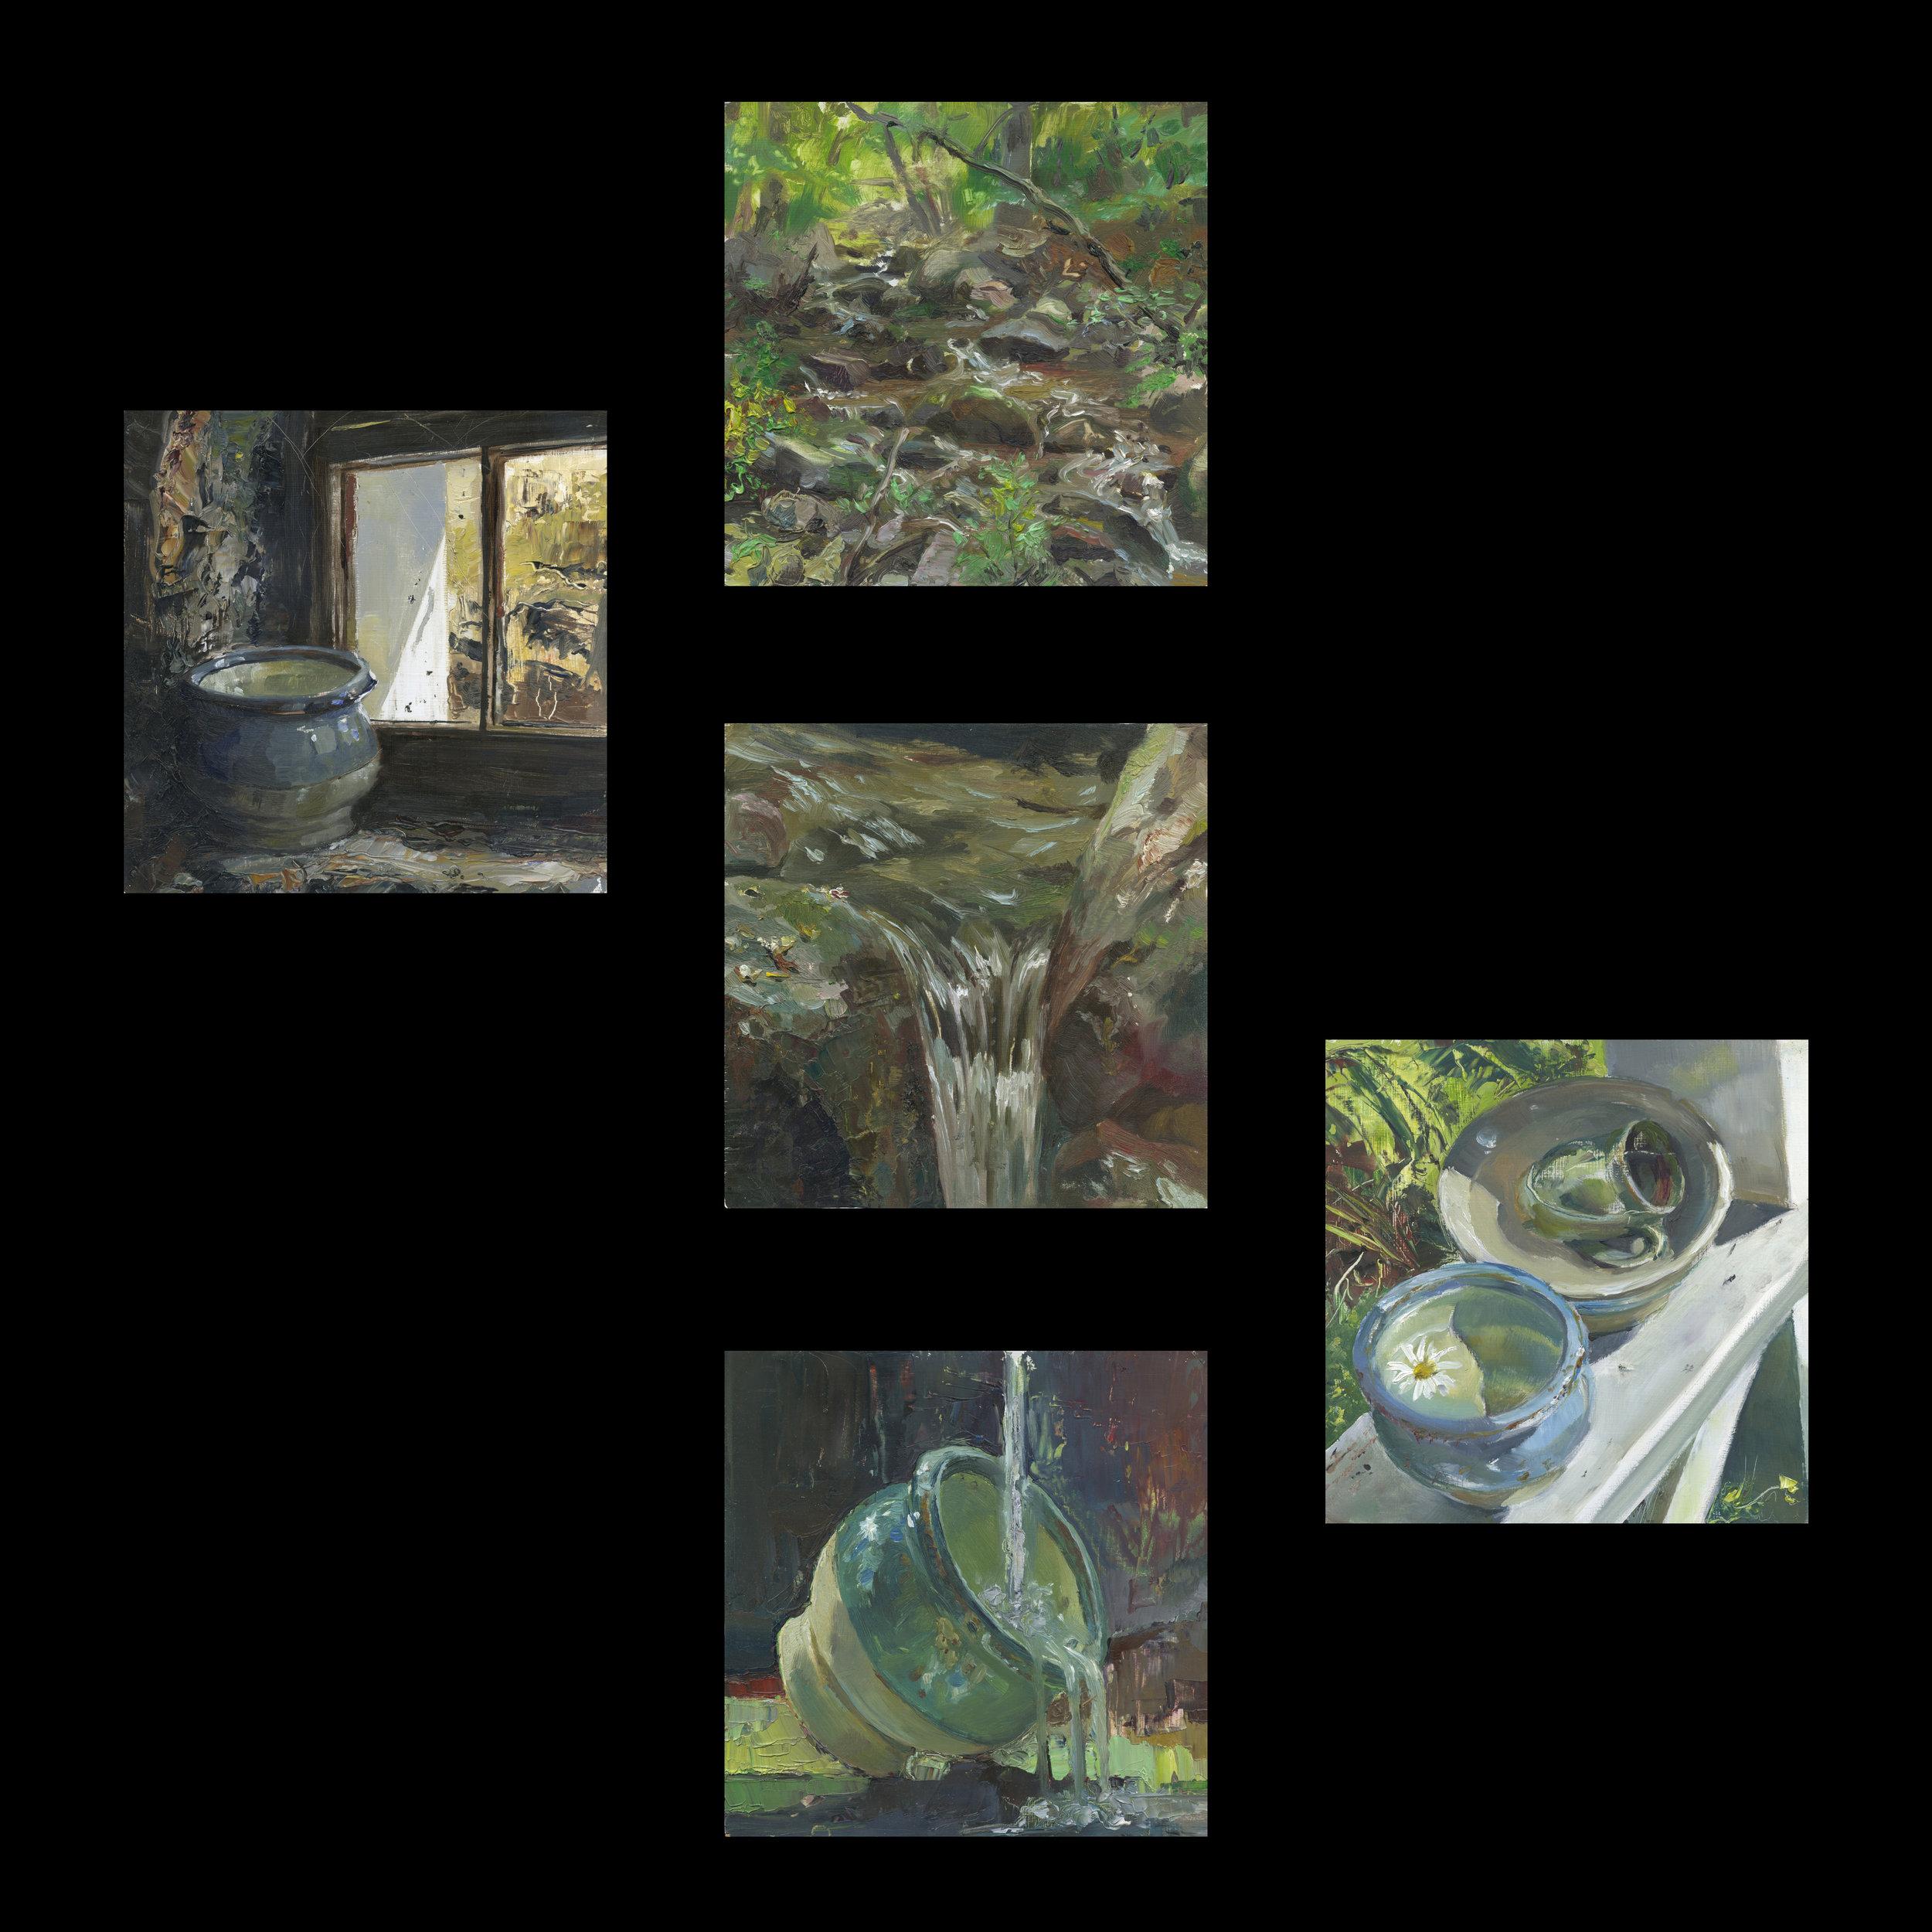 """Overflowing"". Dedrick series of 5 oil on wooden panels. 12x12"" each. 2009."